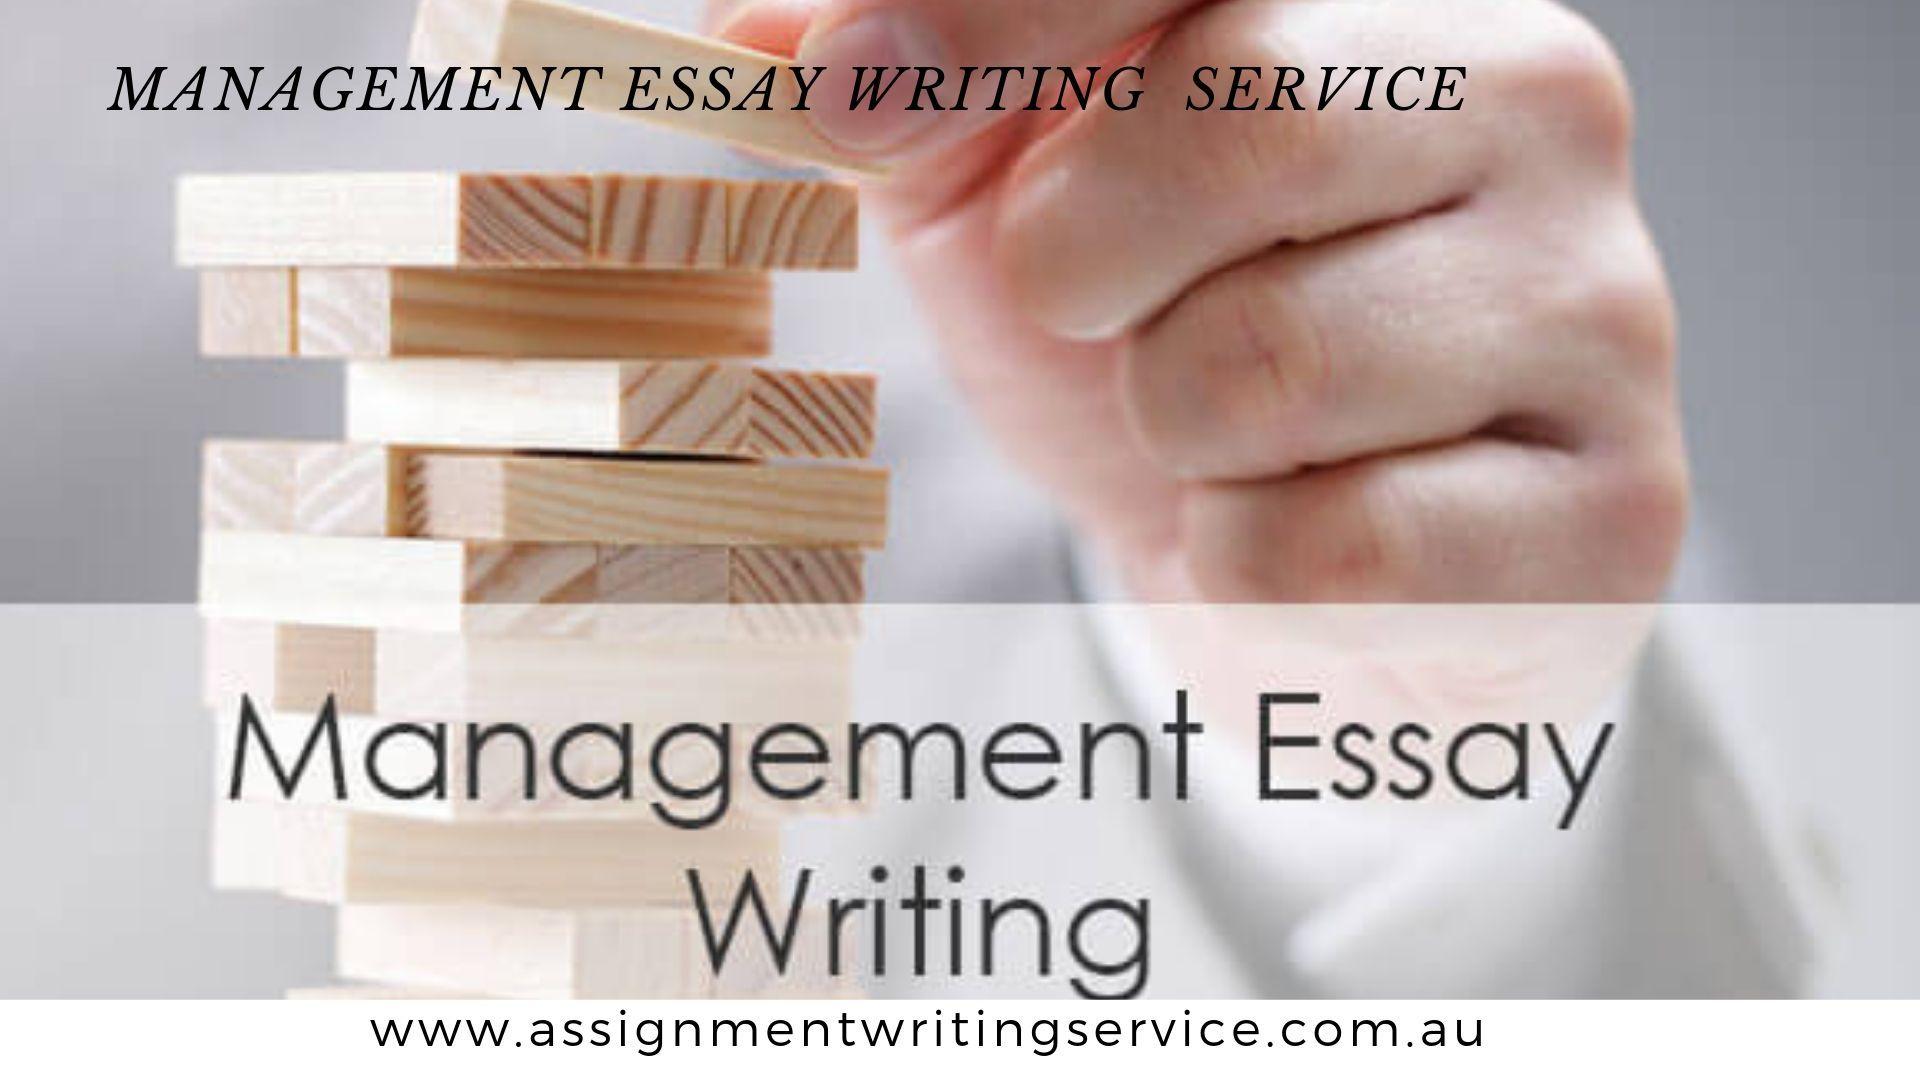 Management_Essay_Writing_Service Get your custom